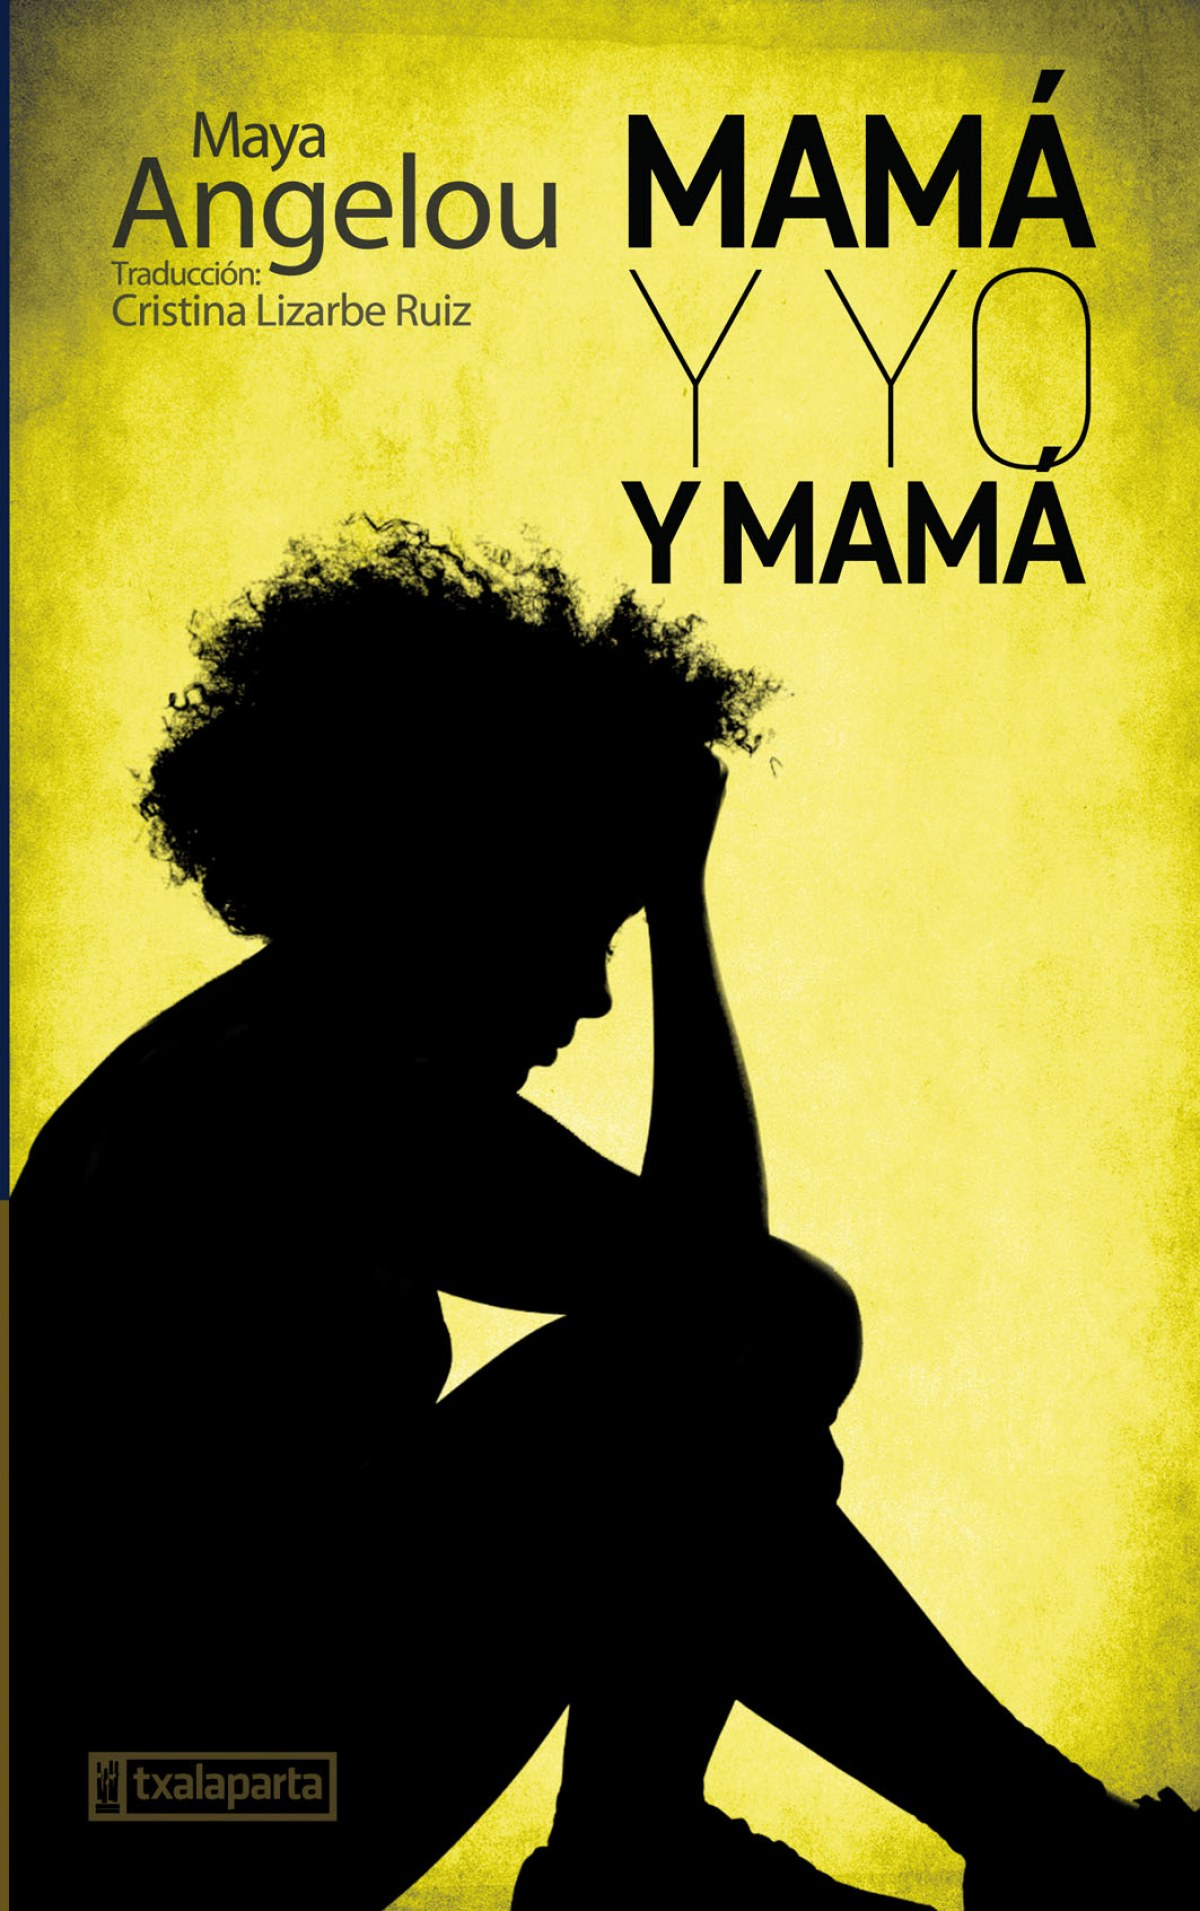 MAMÁ Y YO Y MAMÁ 9788417065645